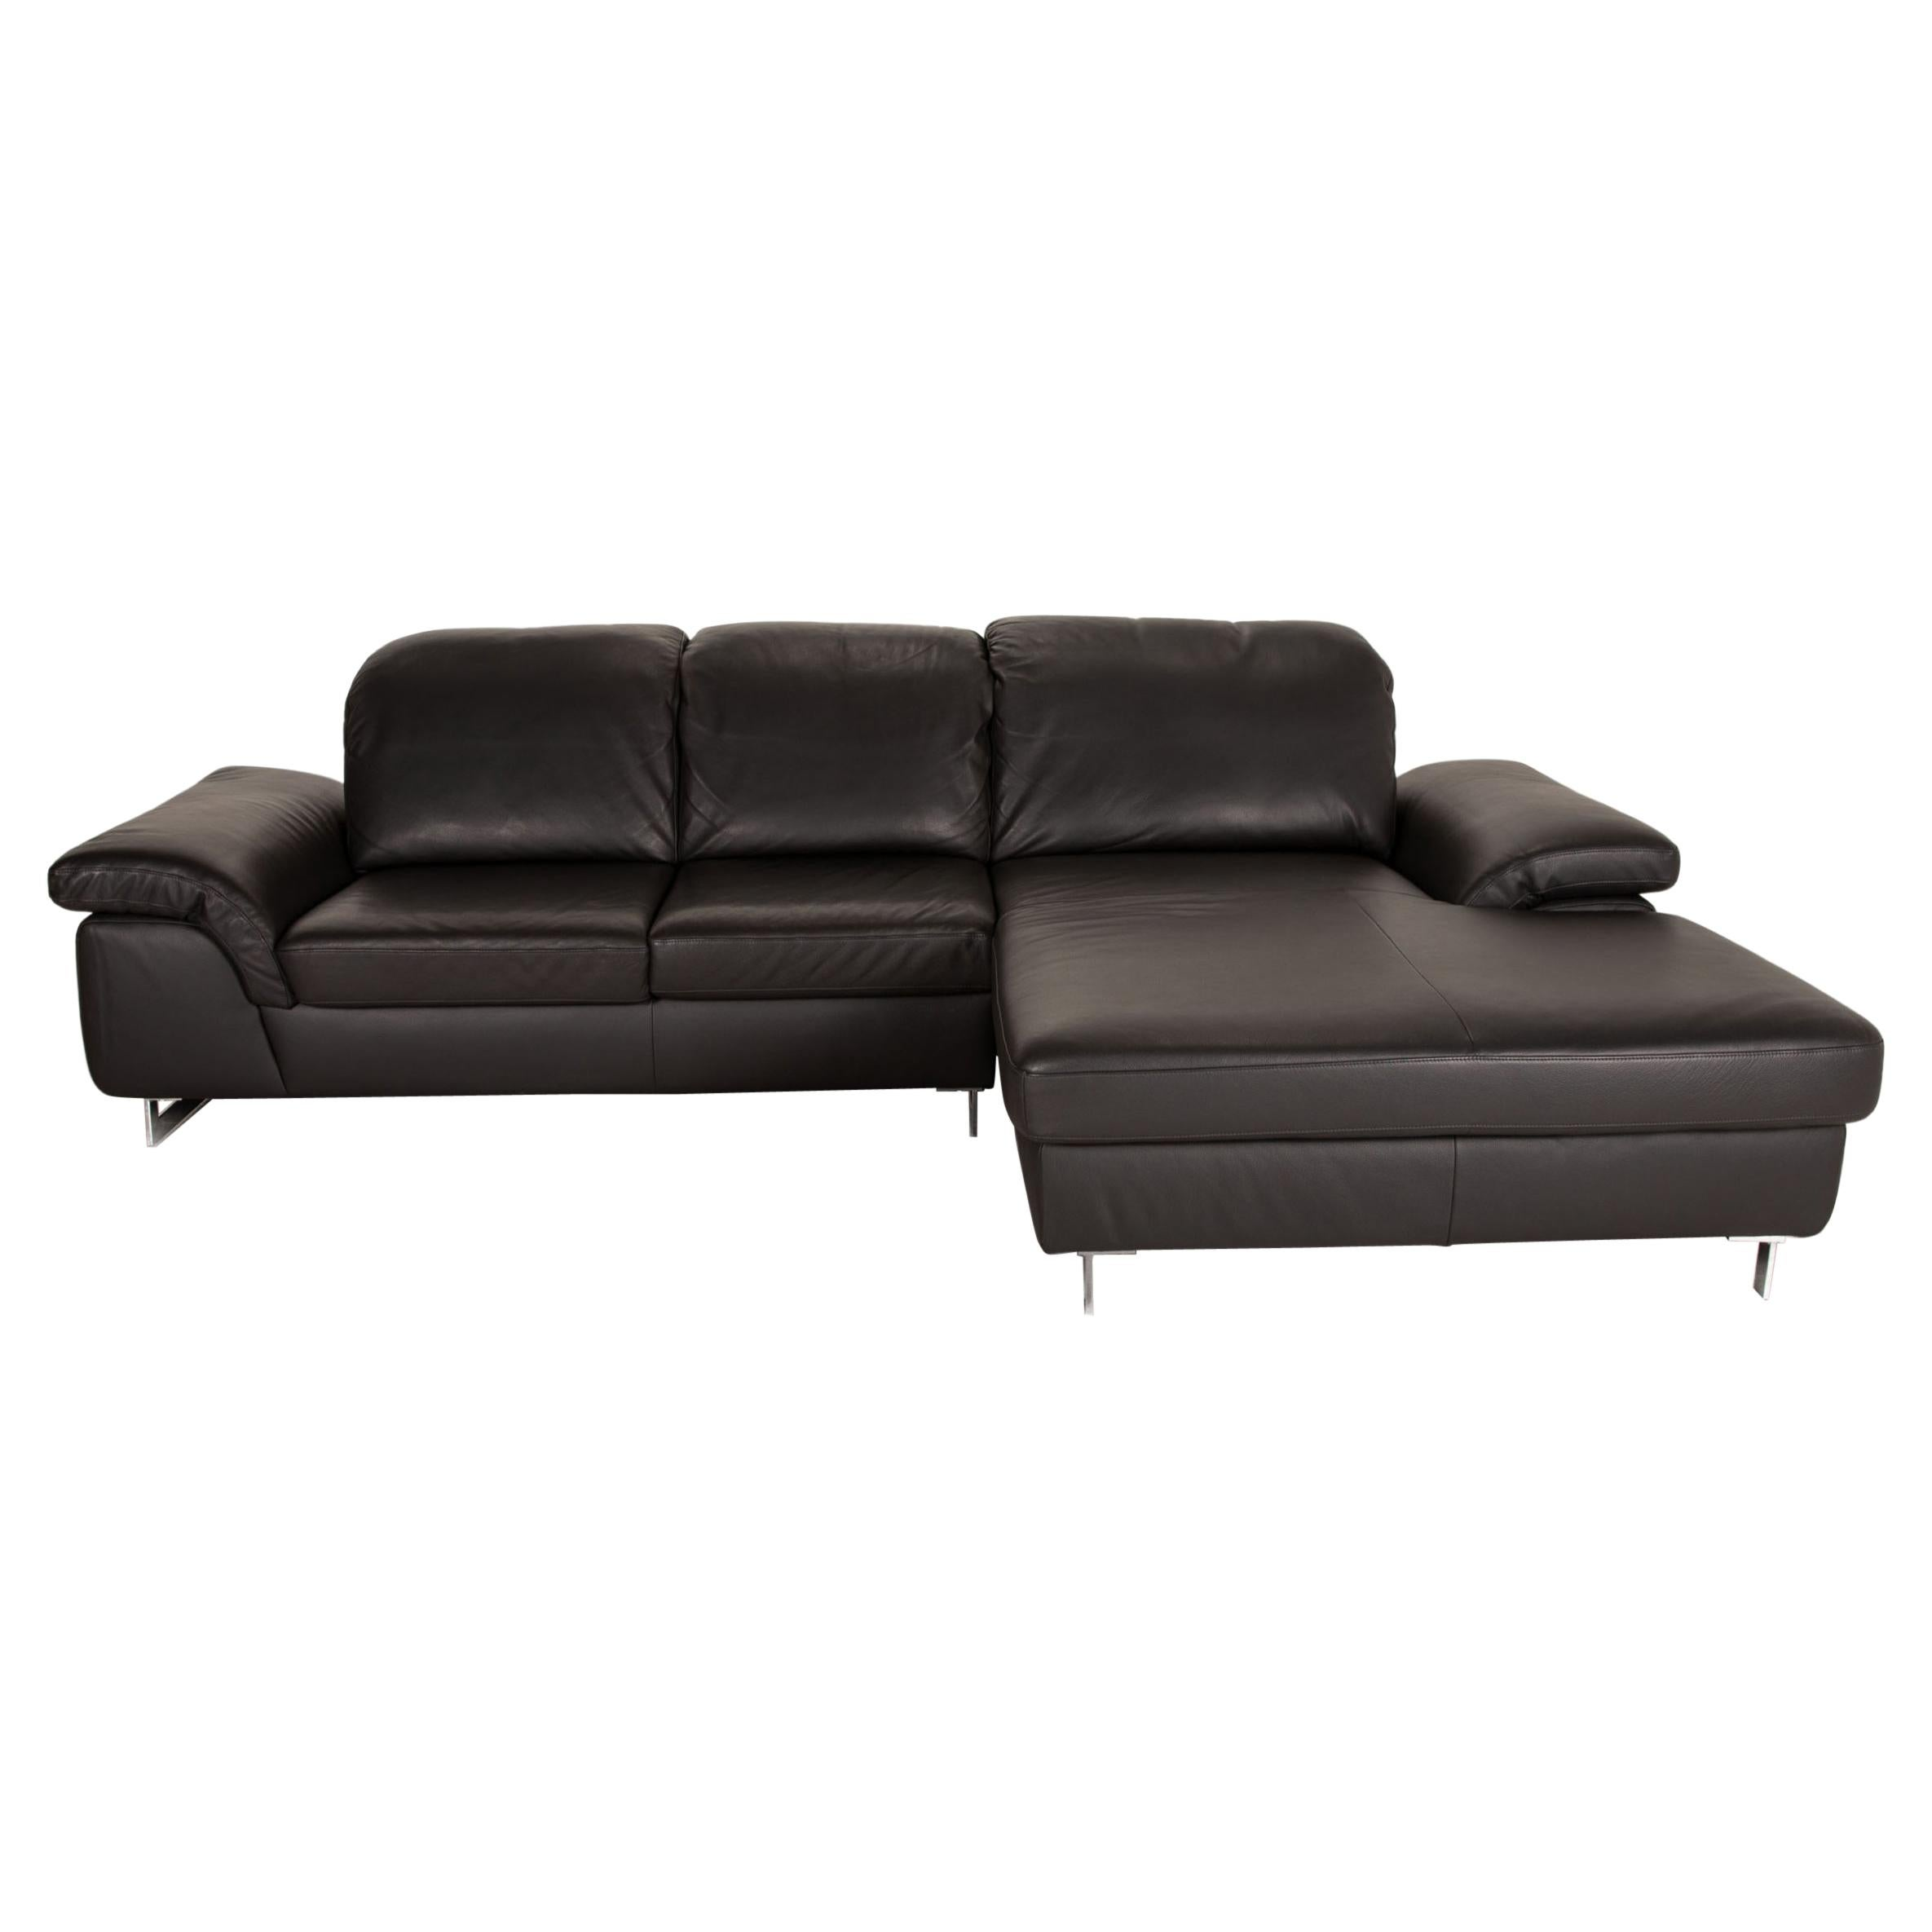 Willi Schillig Joyzze Plus Leather Sofa Gray Corner Sofa Function Couch